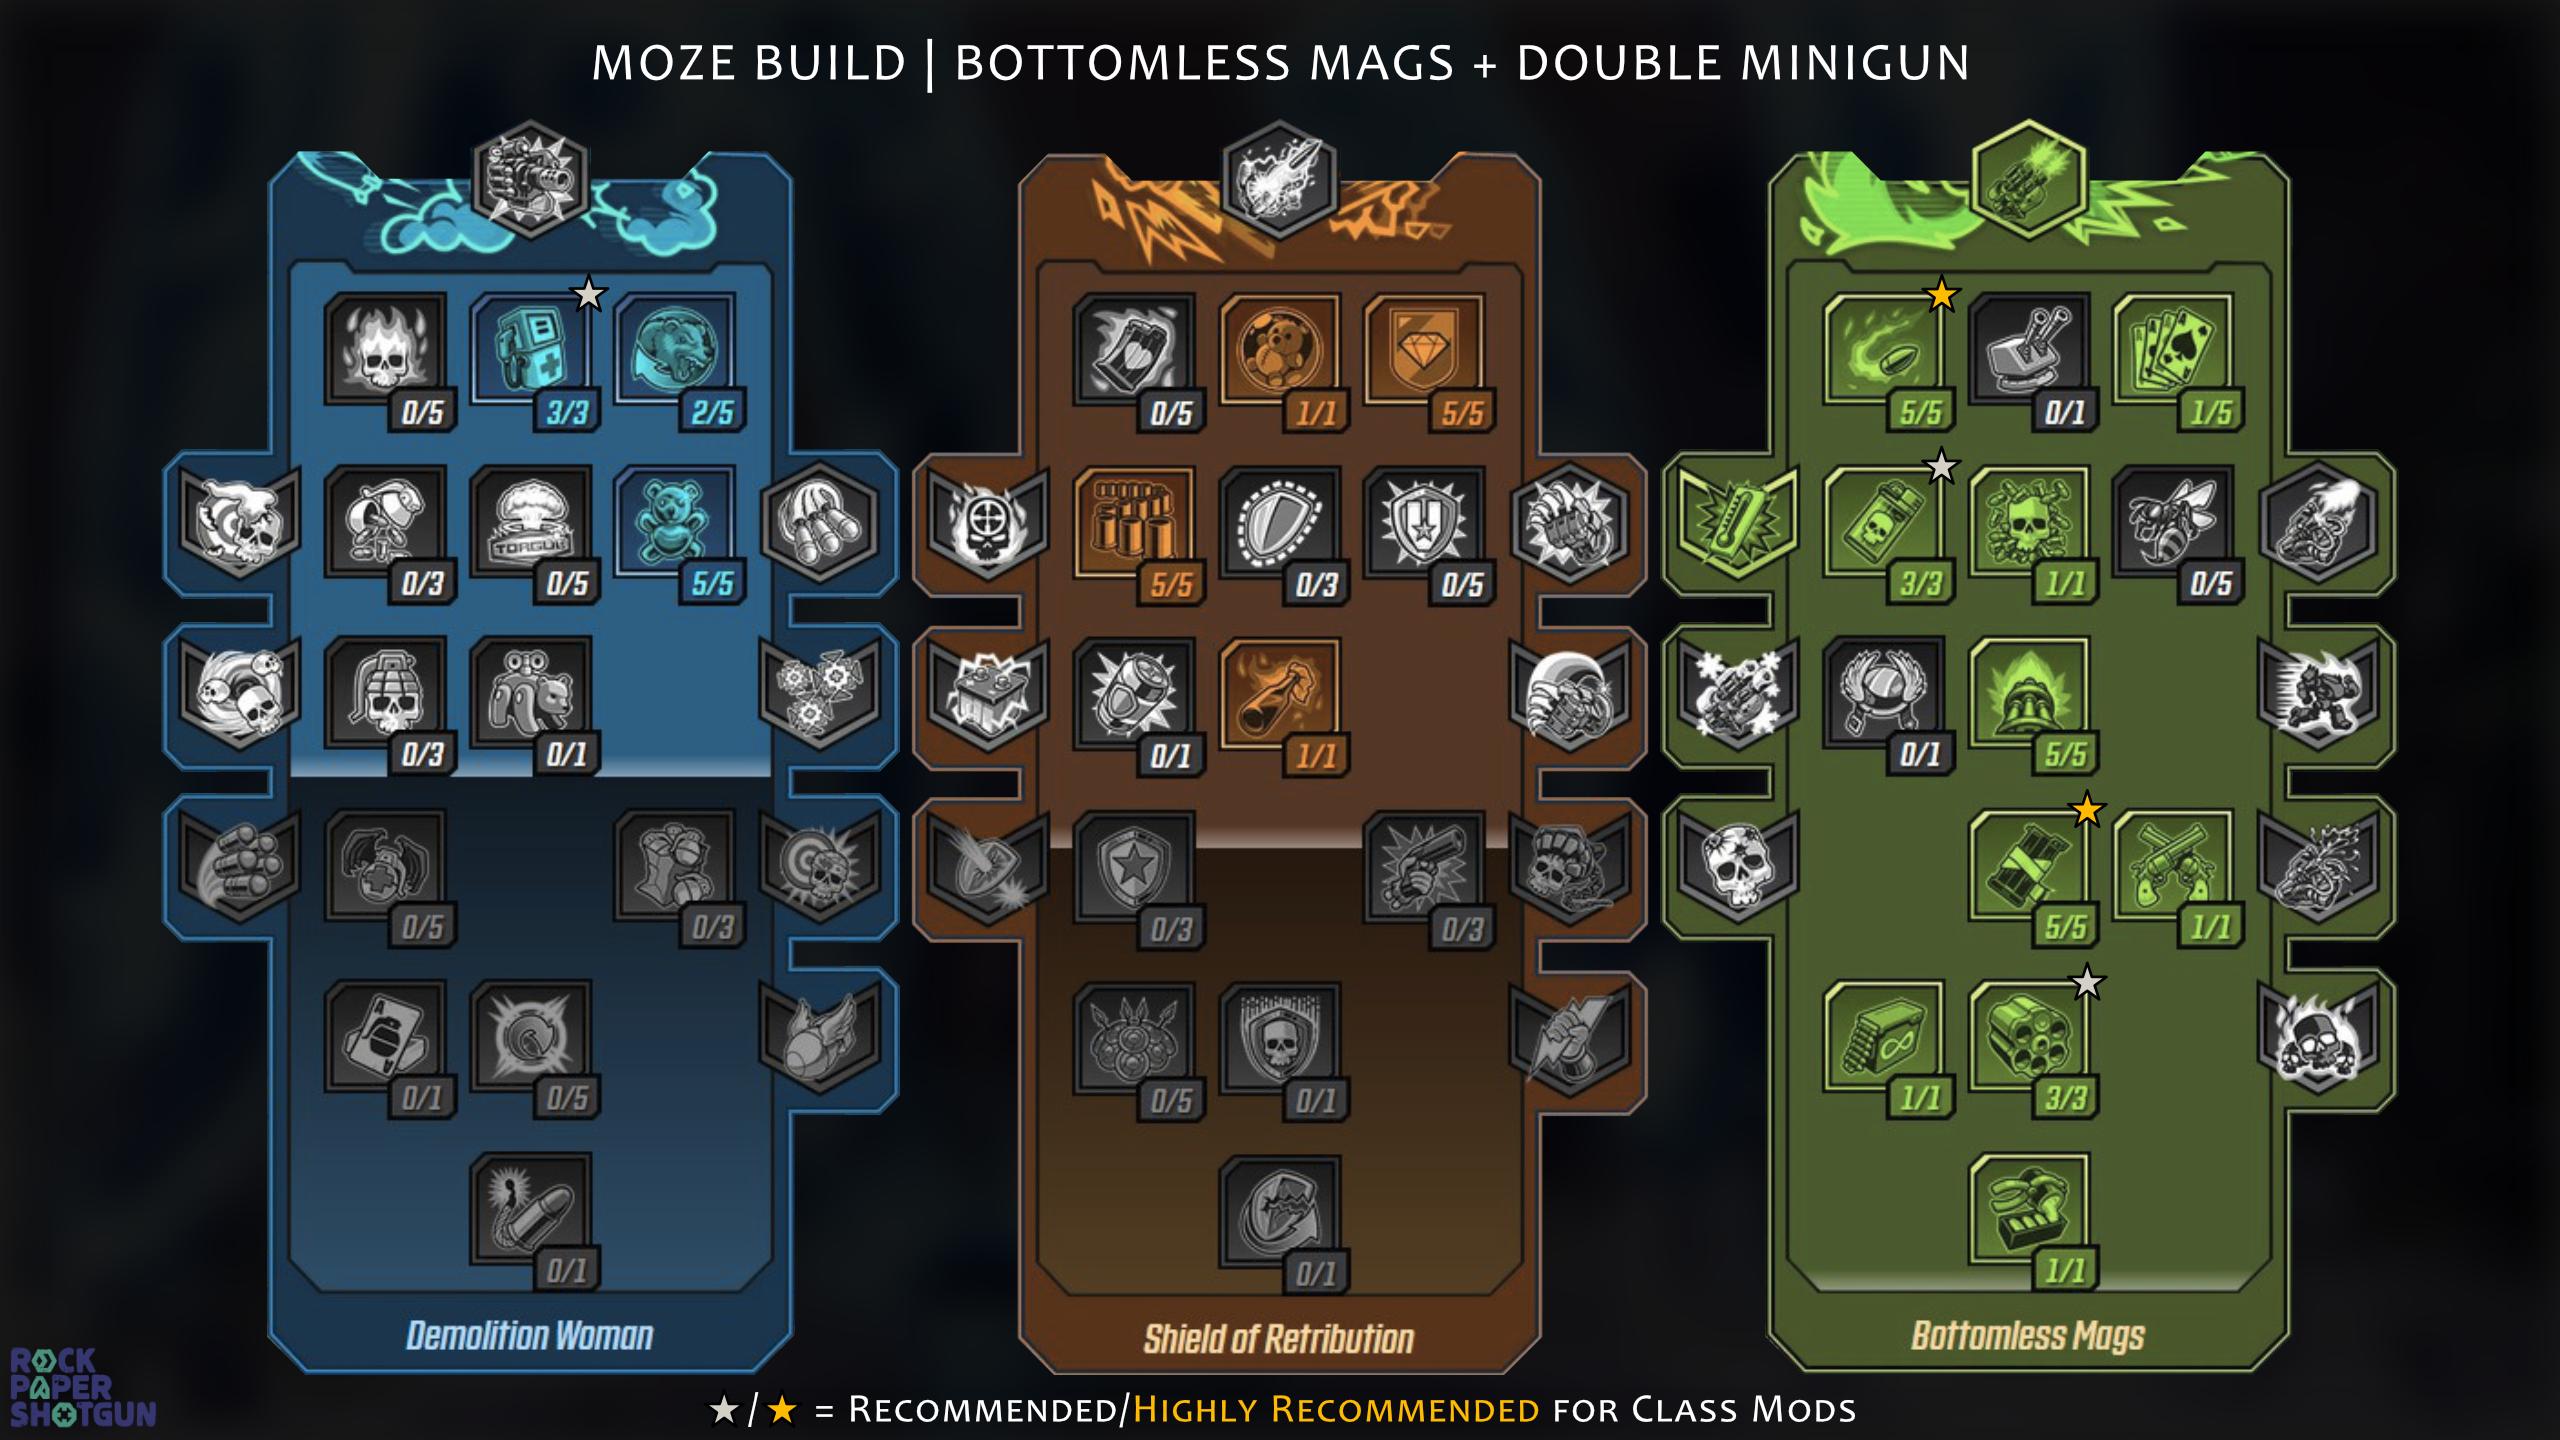 Borderlands 3 Moze build - Bottomless Mags & Double Minigun